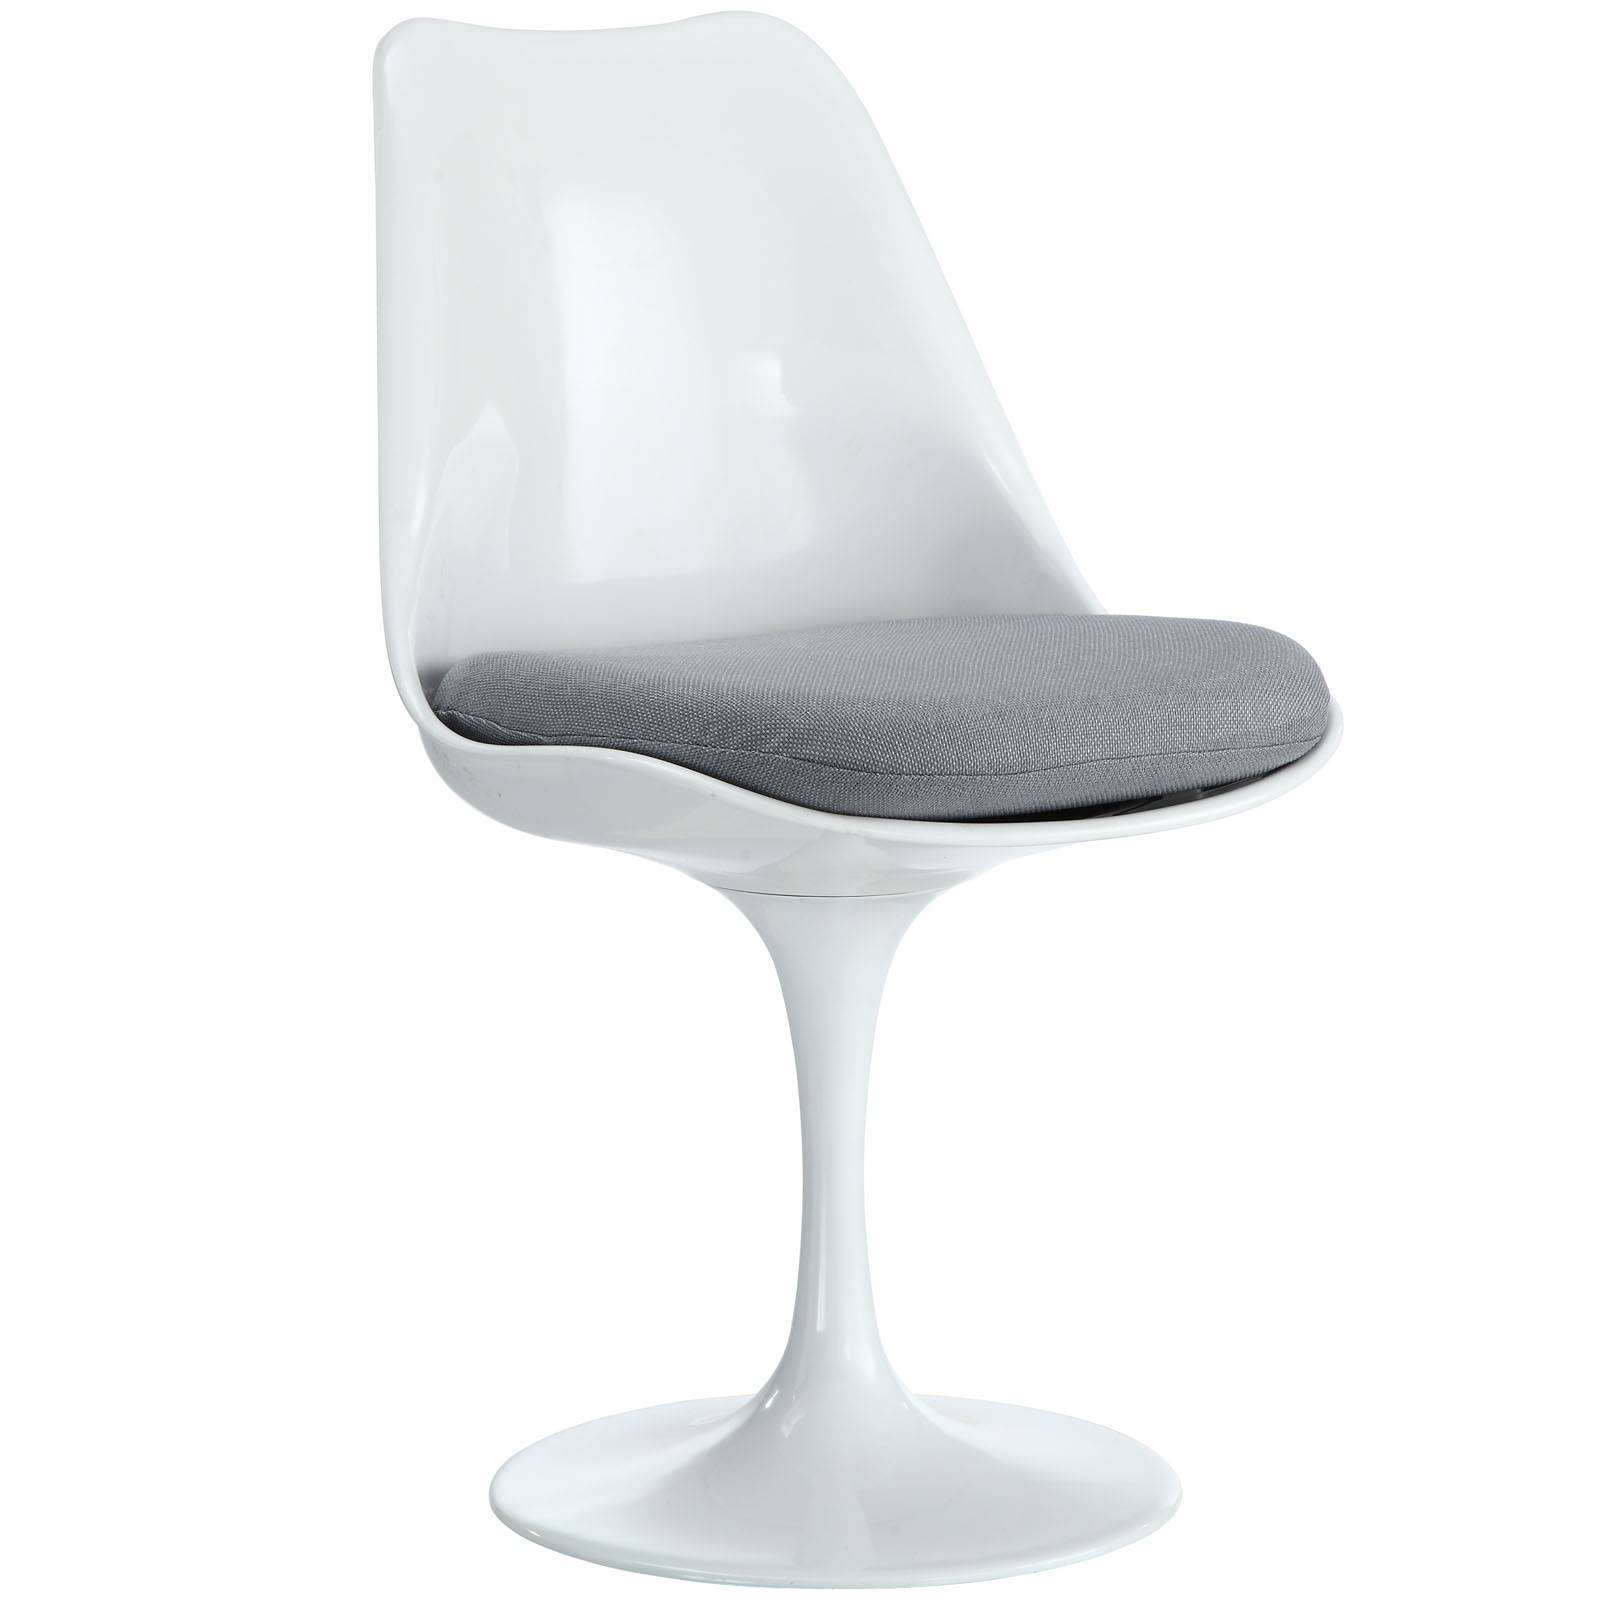 tulip dining room chairs adirondack chair plans dxf eero saarinen style side